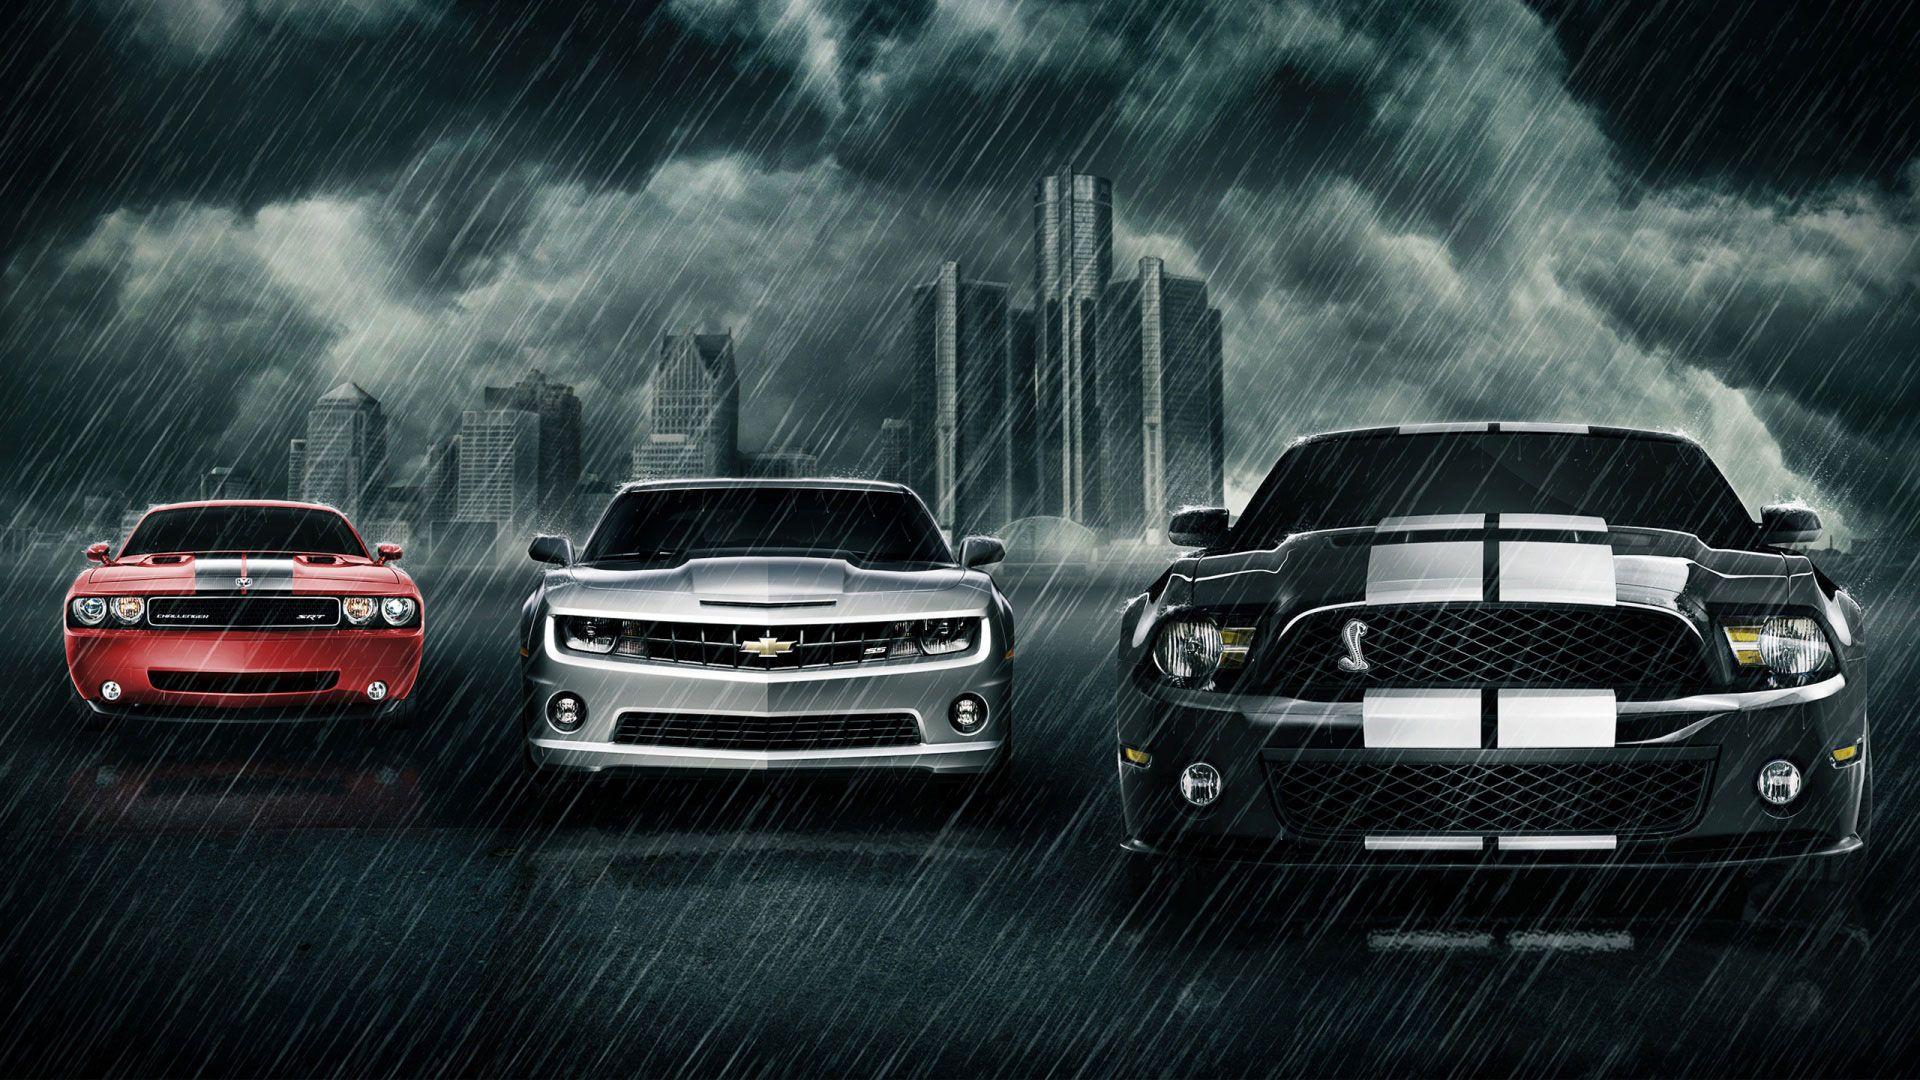 Cars In City Rain Desktop Background Wallpaper Hd 1080p Car Wallpapers Mustang Wallpaper Chevrolet Camaro